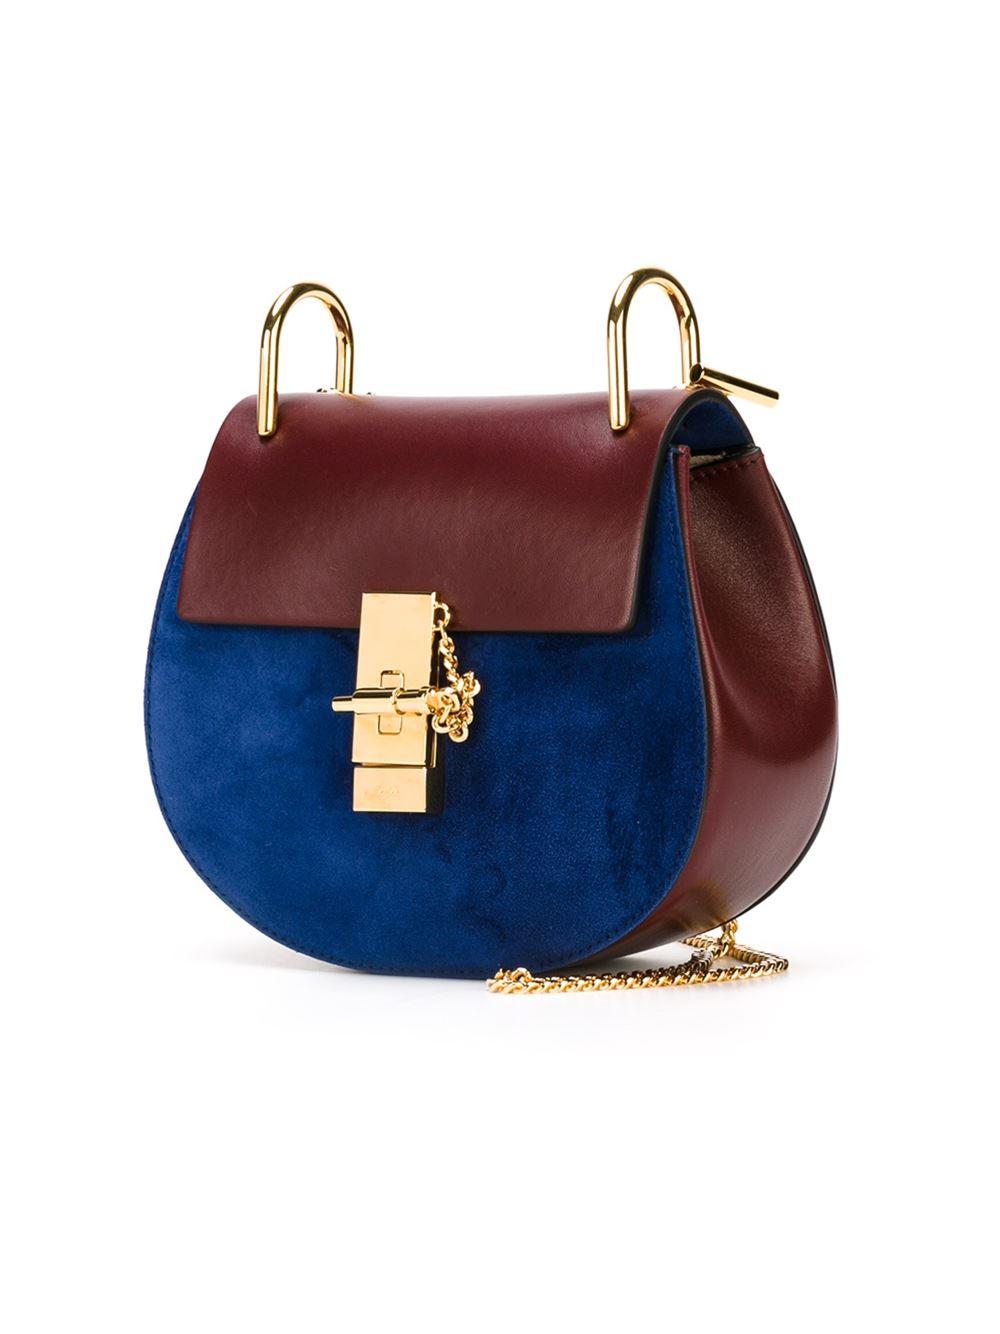 chloe replica handbags